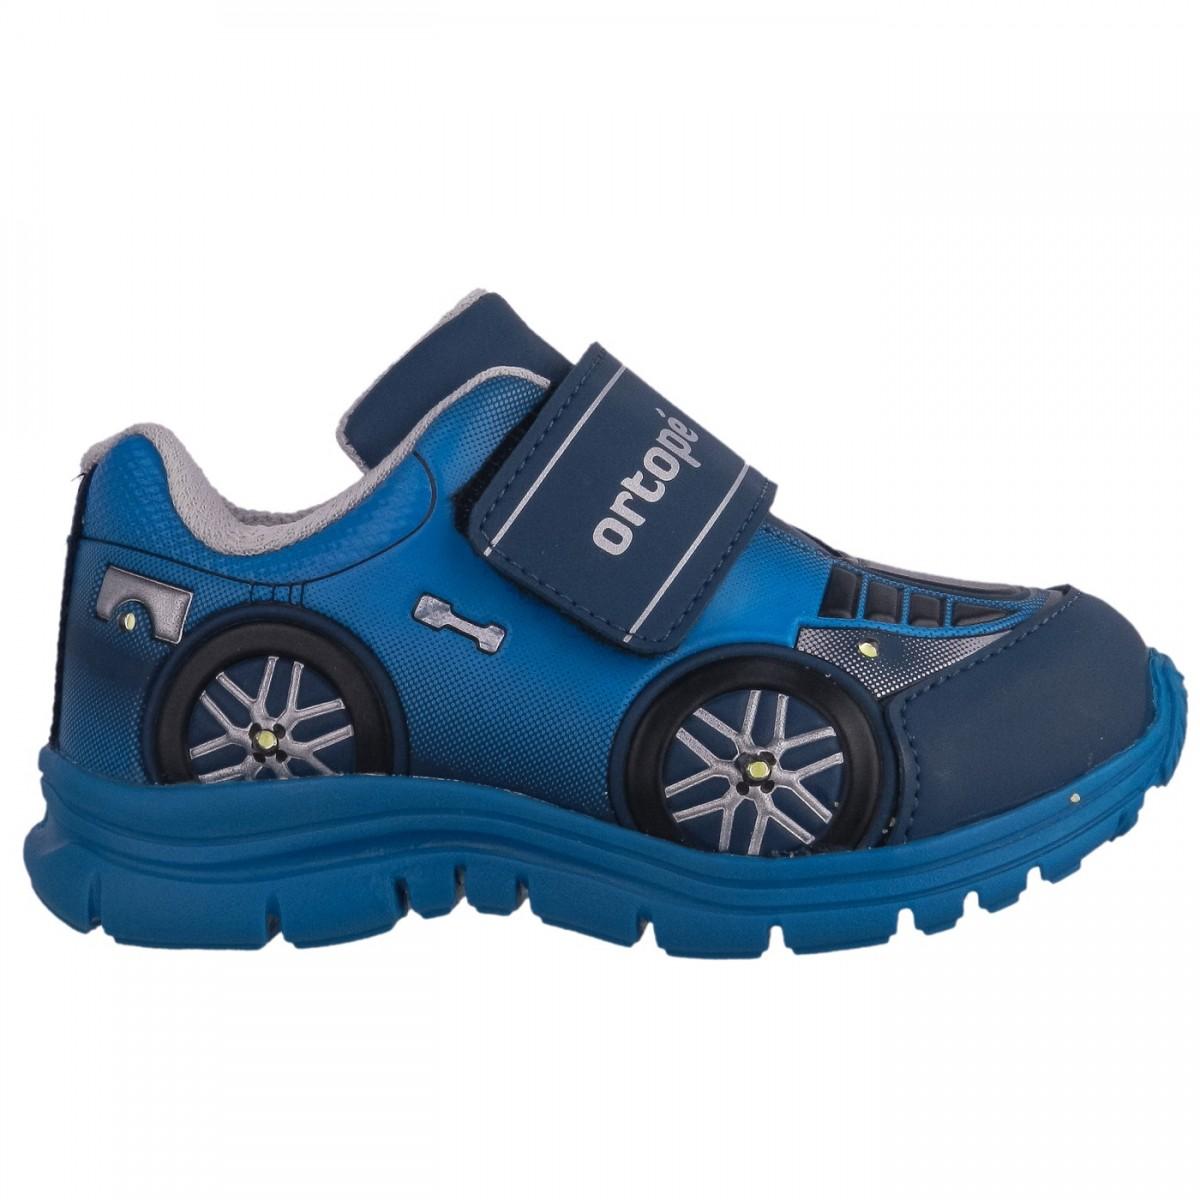 37d06f390f Bizz Store - Tênis Infantil Masculino Ortopé DNA Light Com Luzes